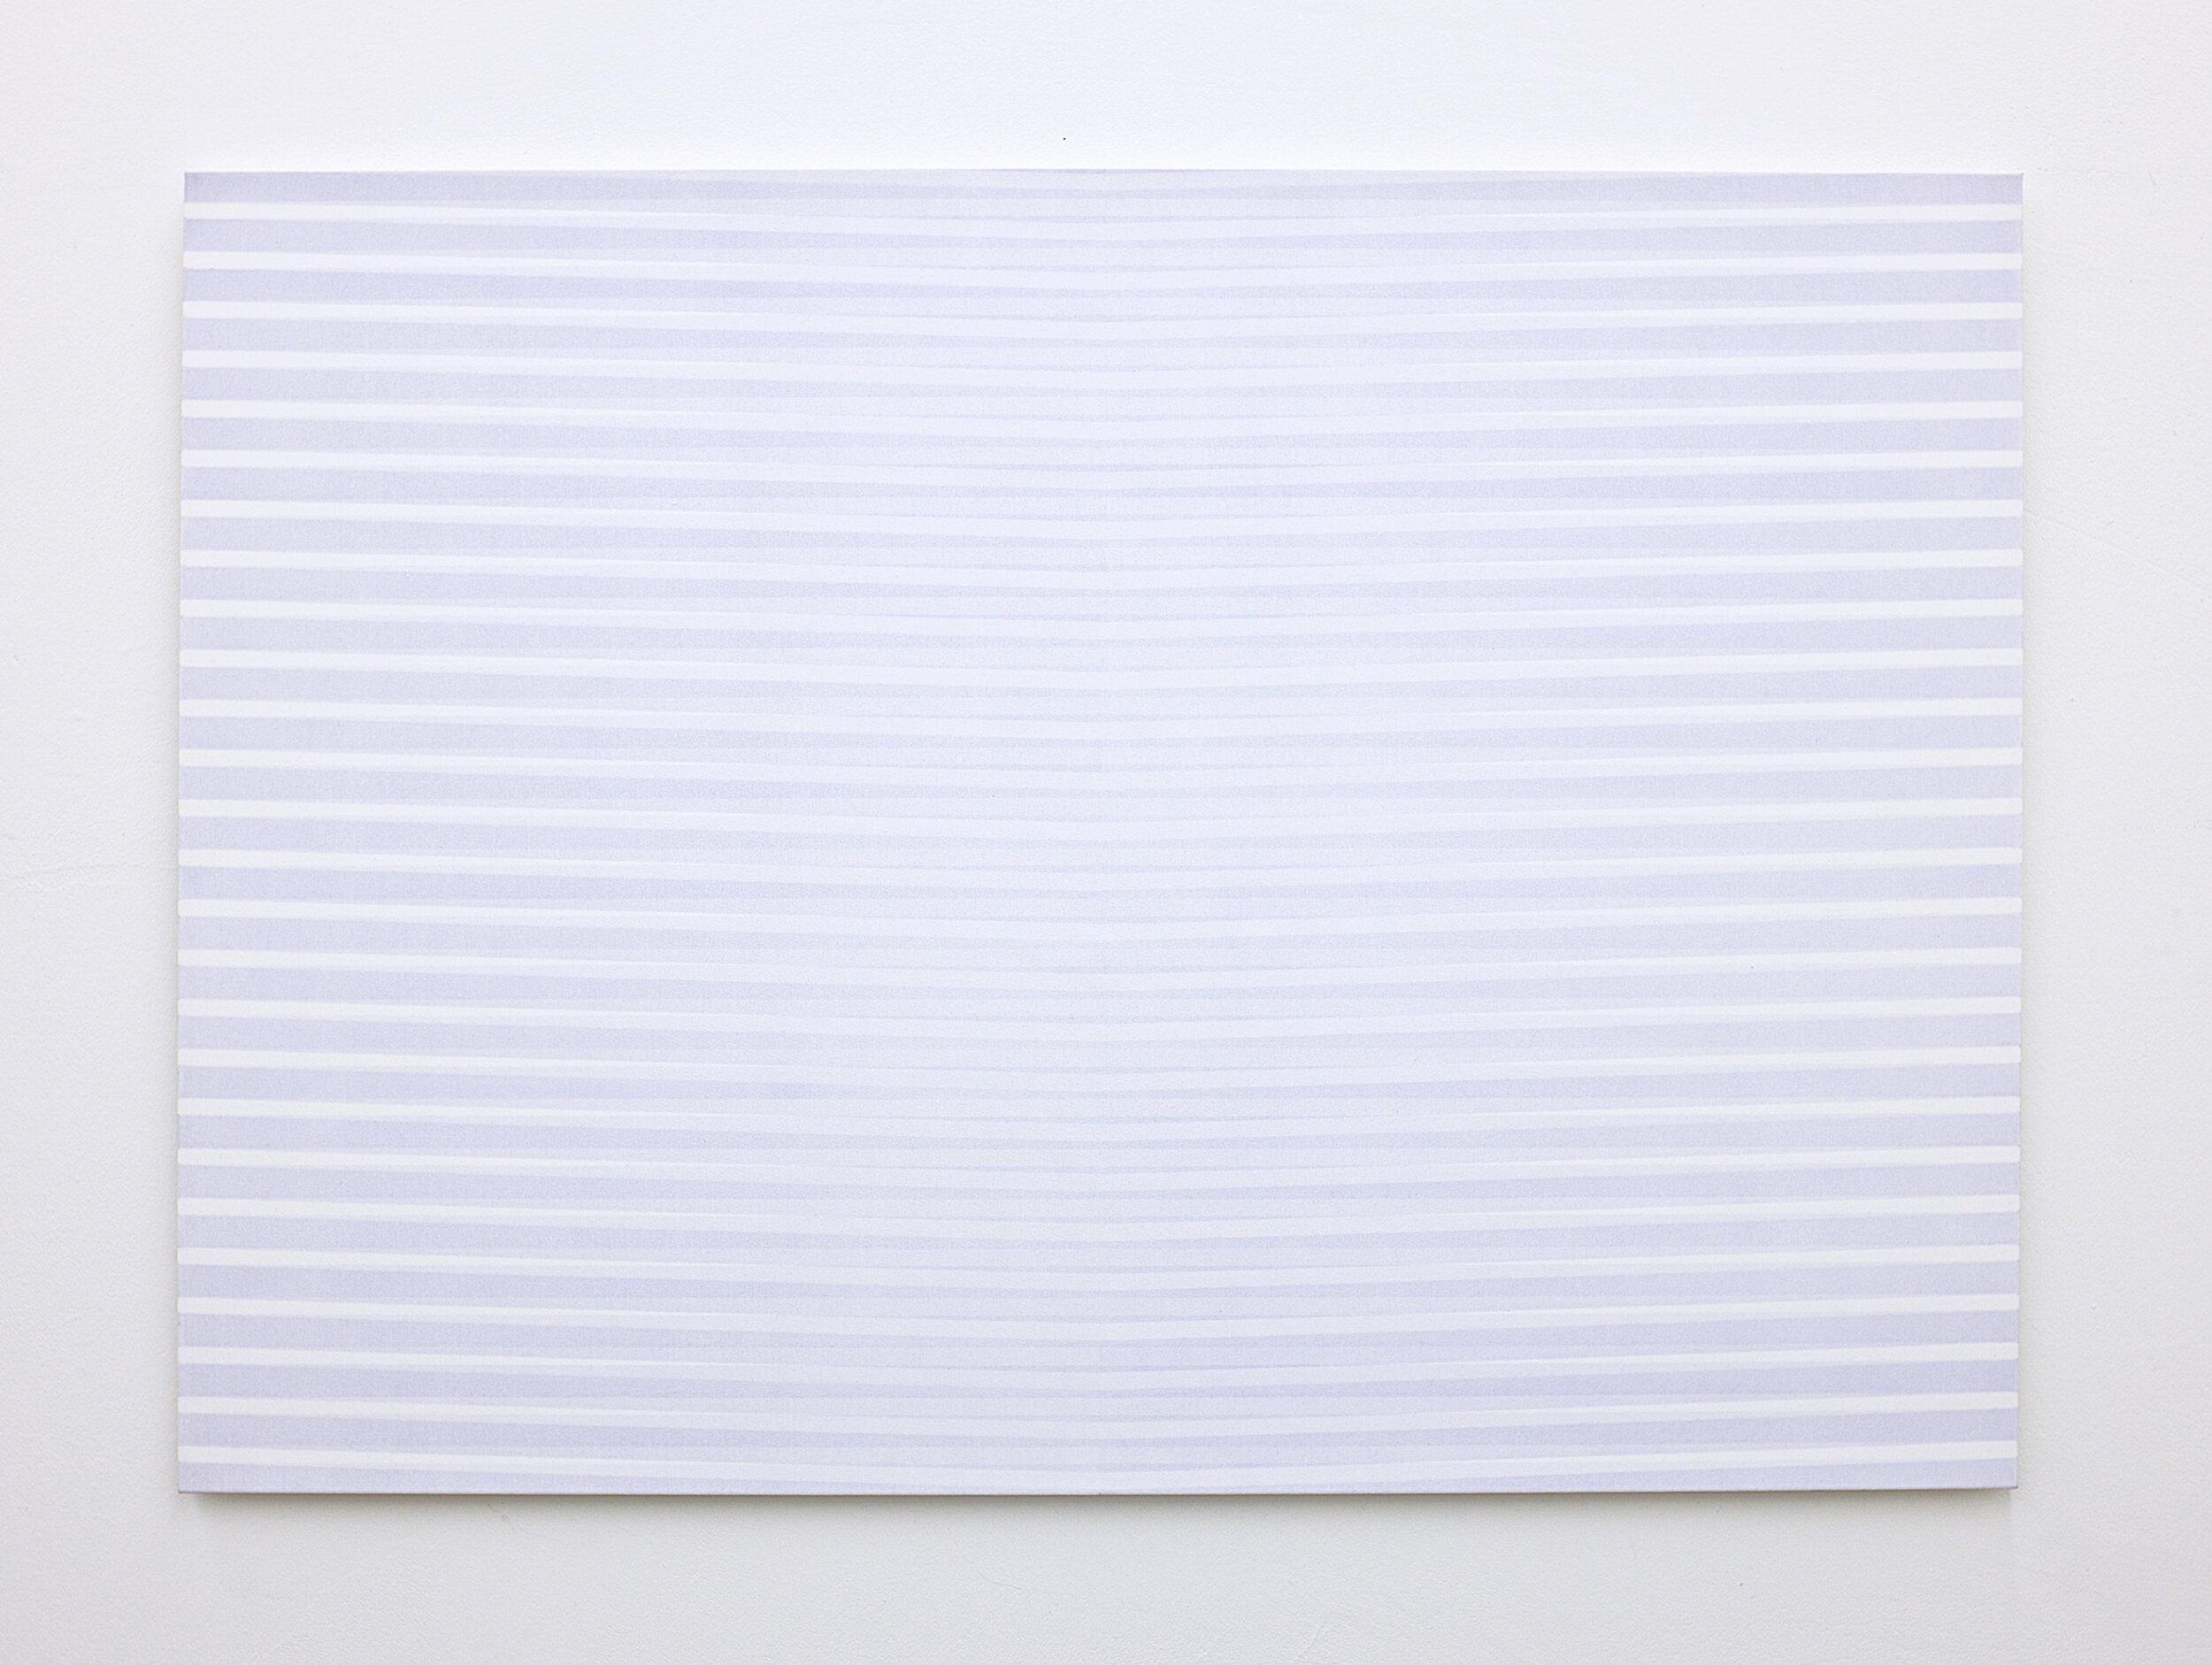 bild nr. 10/2019 - 100 x 140cm - acryl auf baumwolle/alu